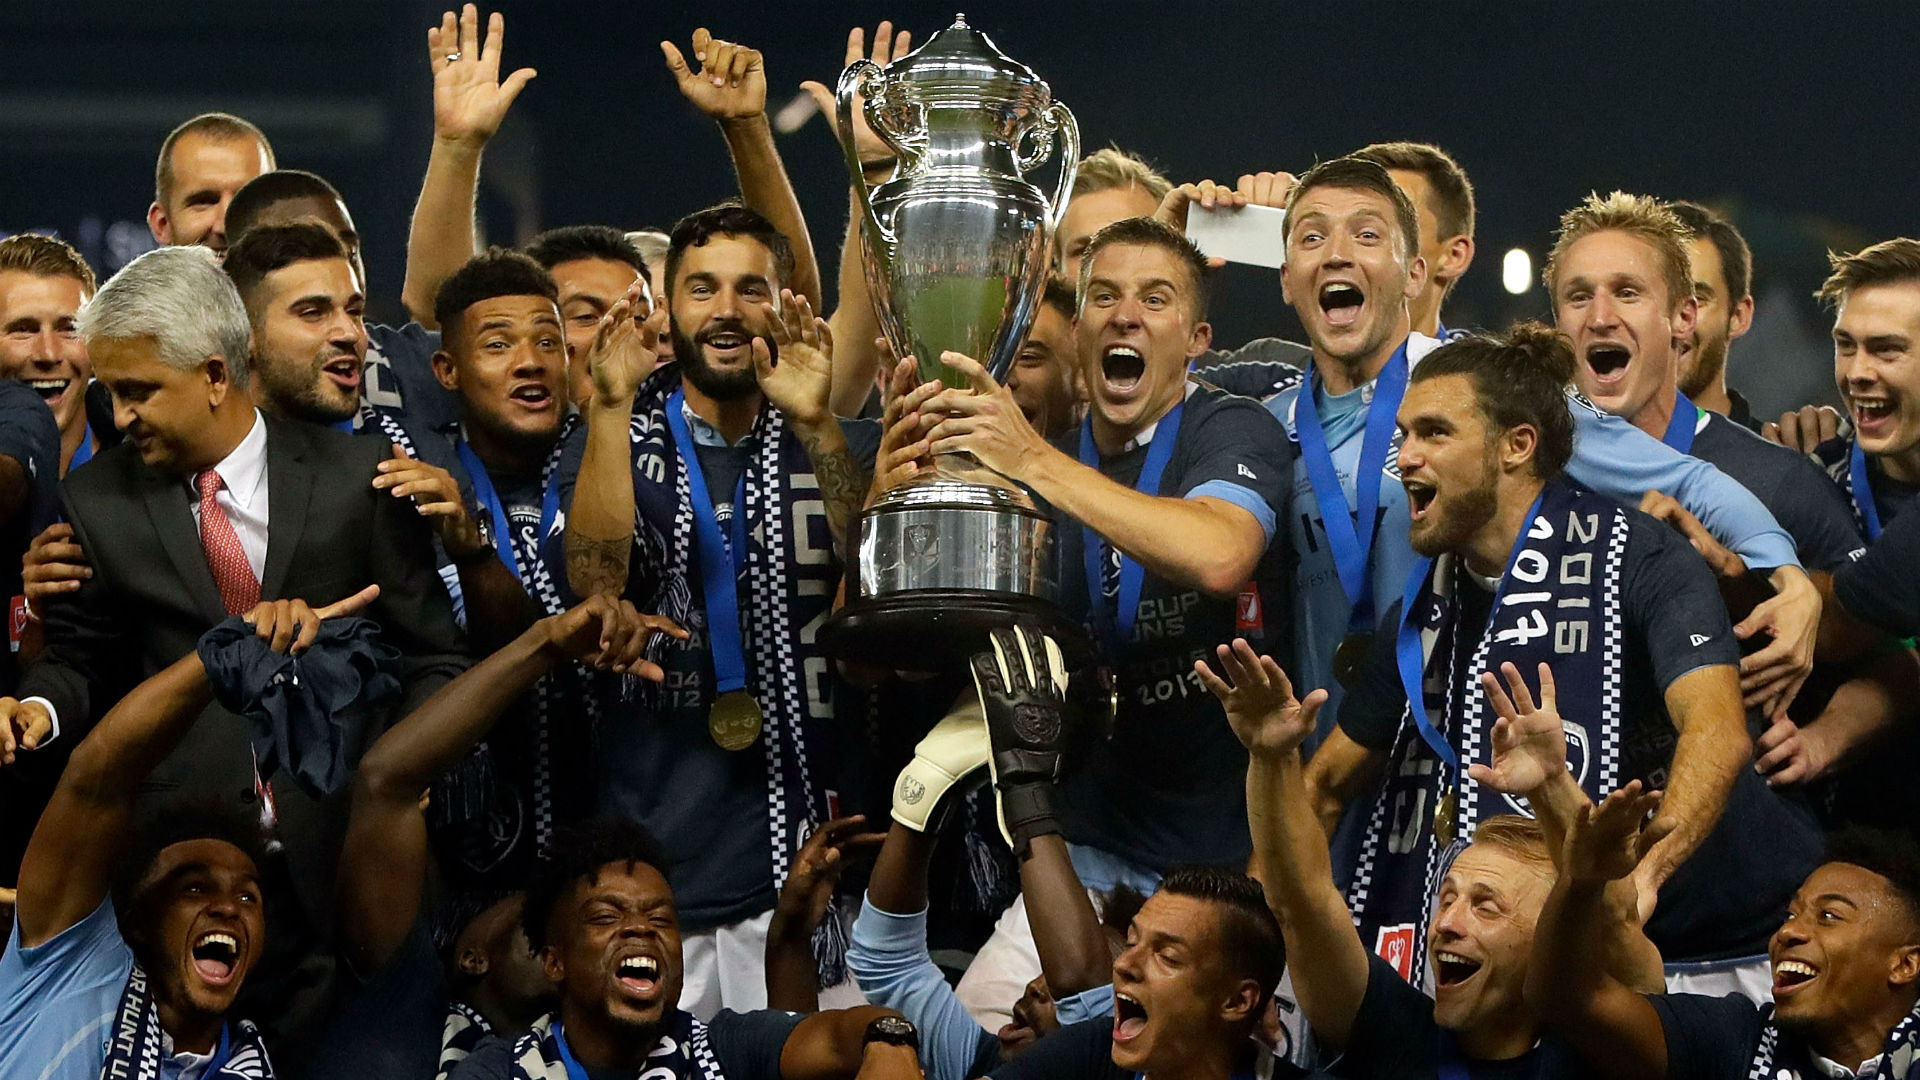 Sporting Kansas City U.S. Open Cup